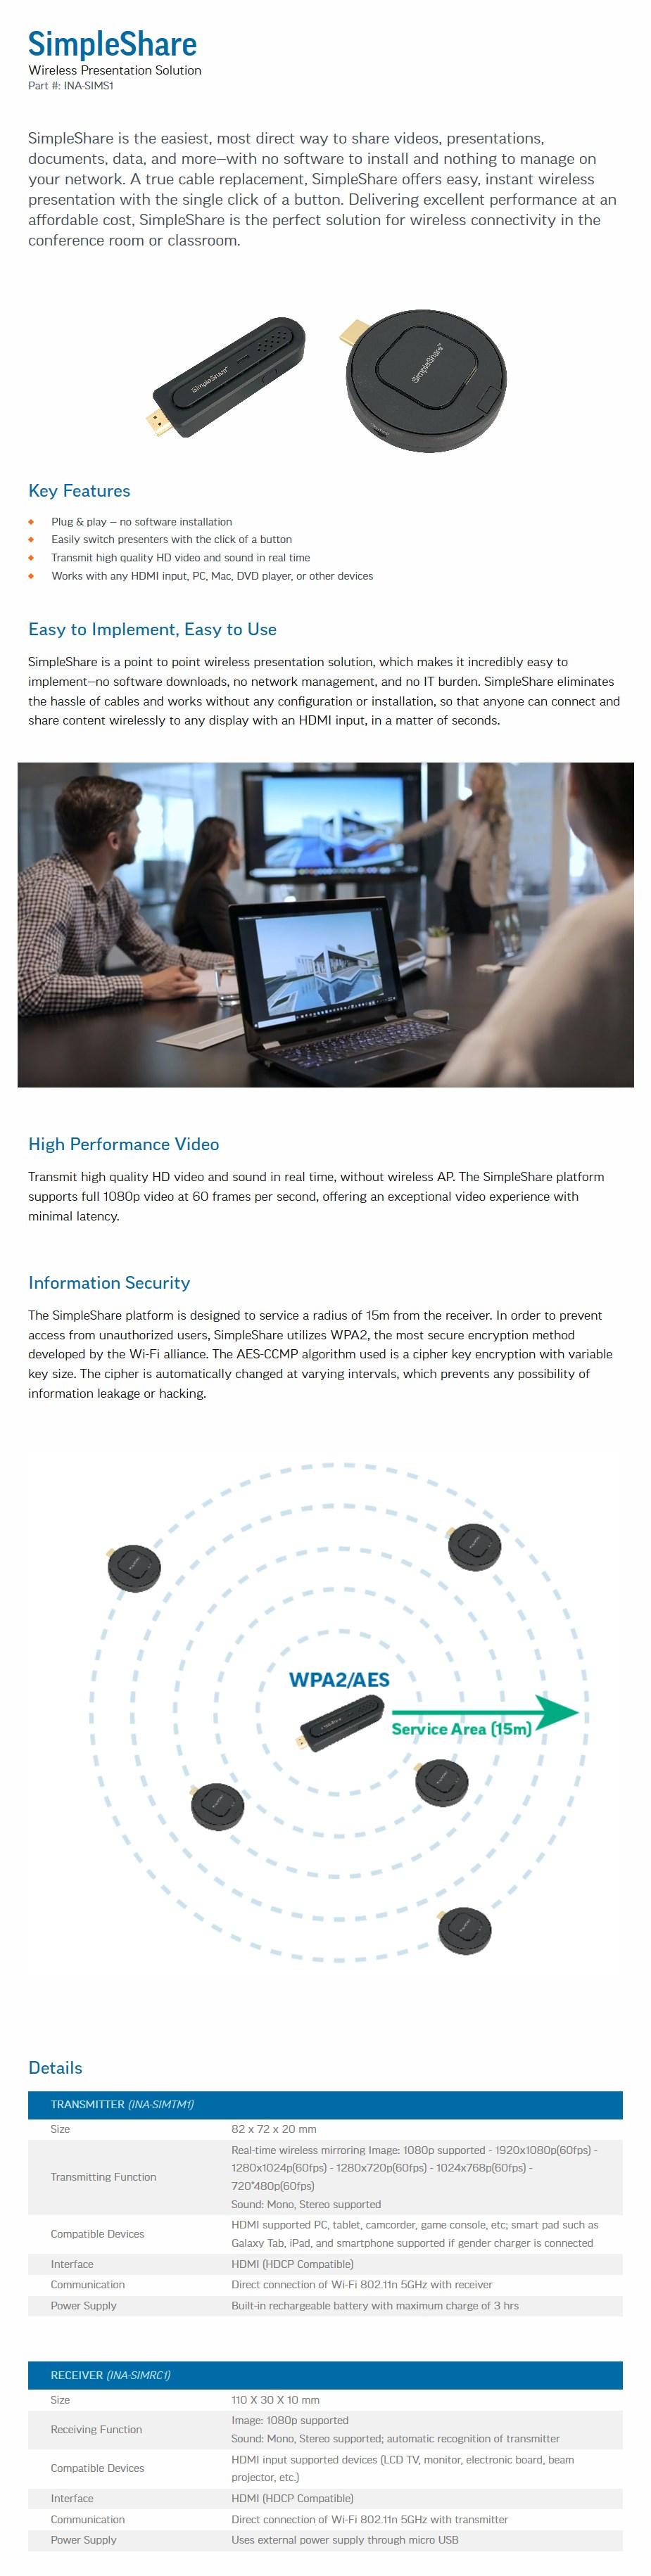 InFocus SimpleShare Wireless Presentation Solution - Desktop Overview 2